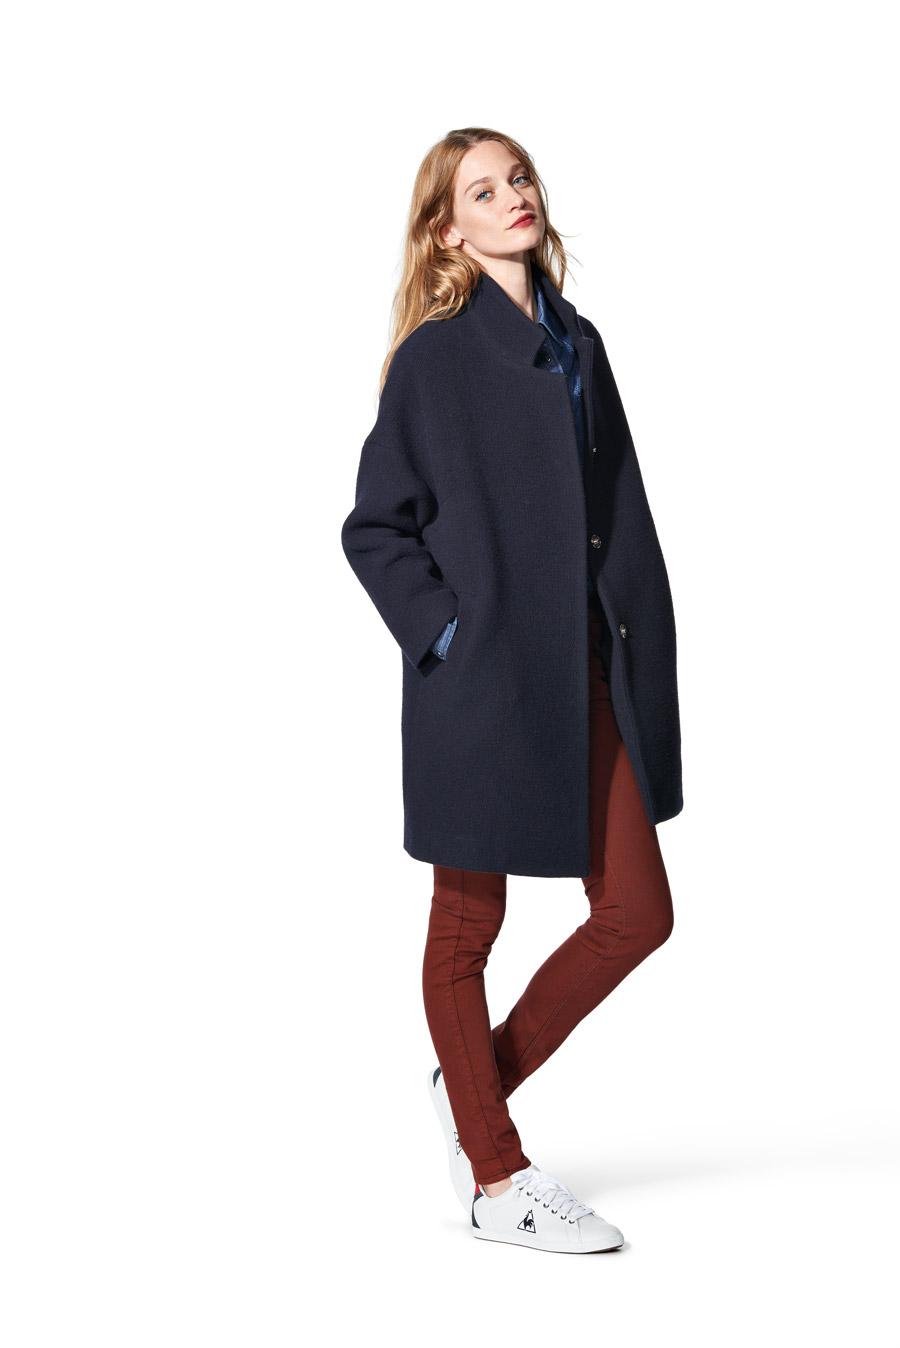 Femme-manteau-classic-021.jpg